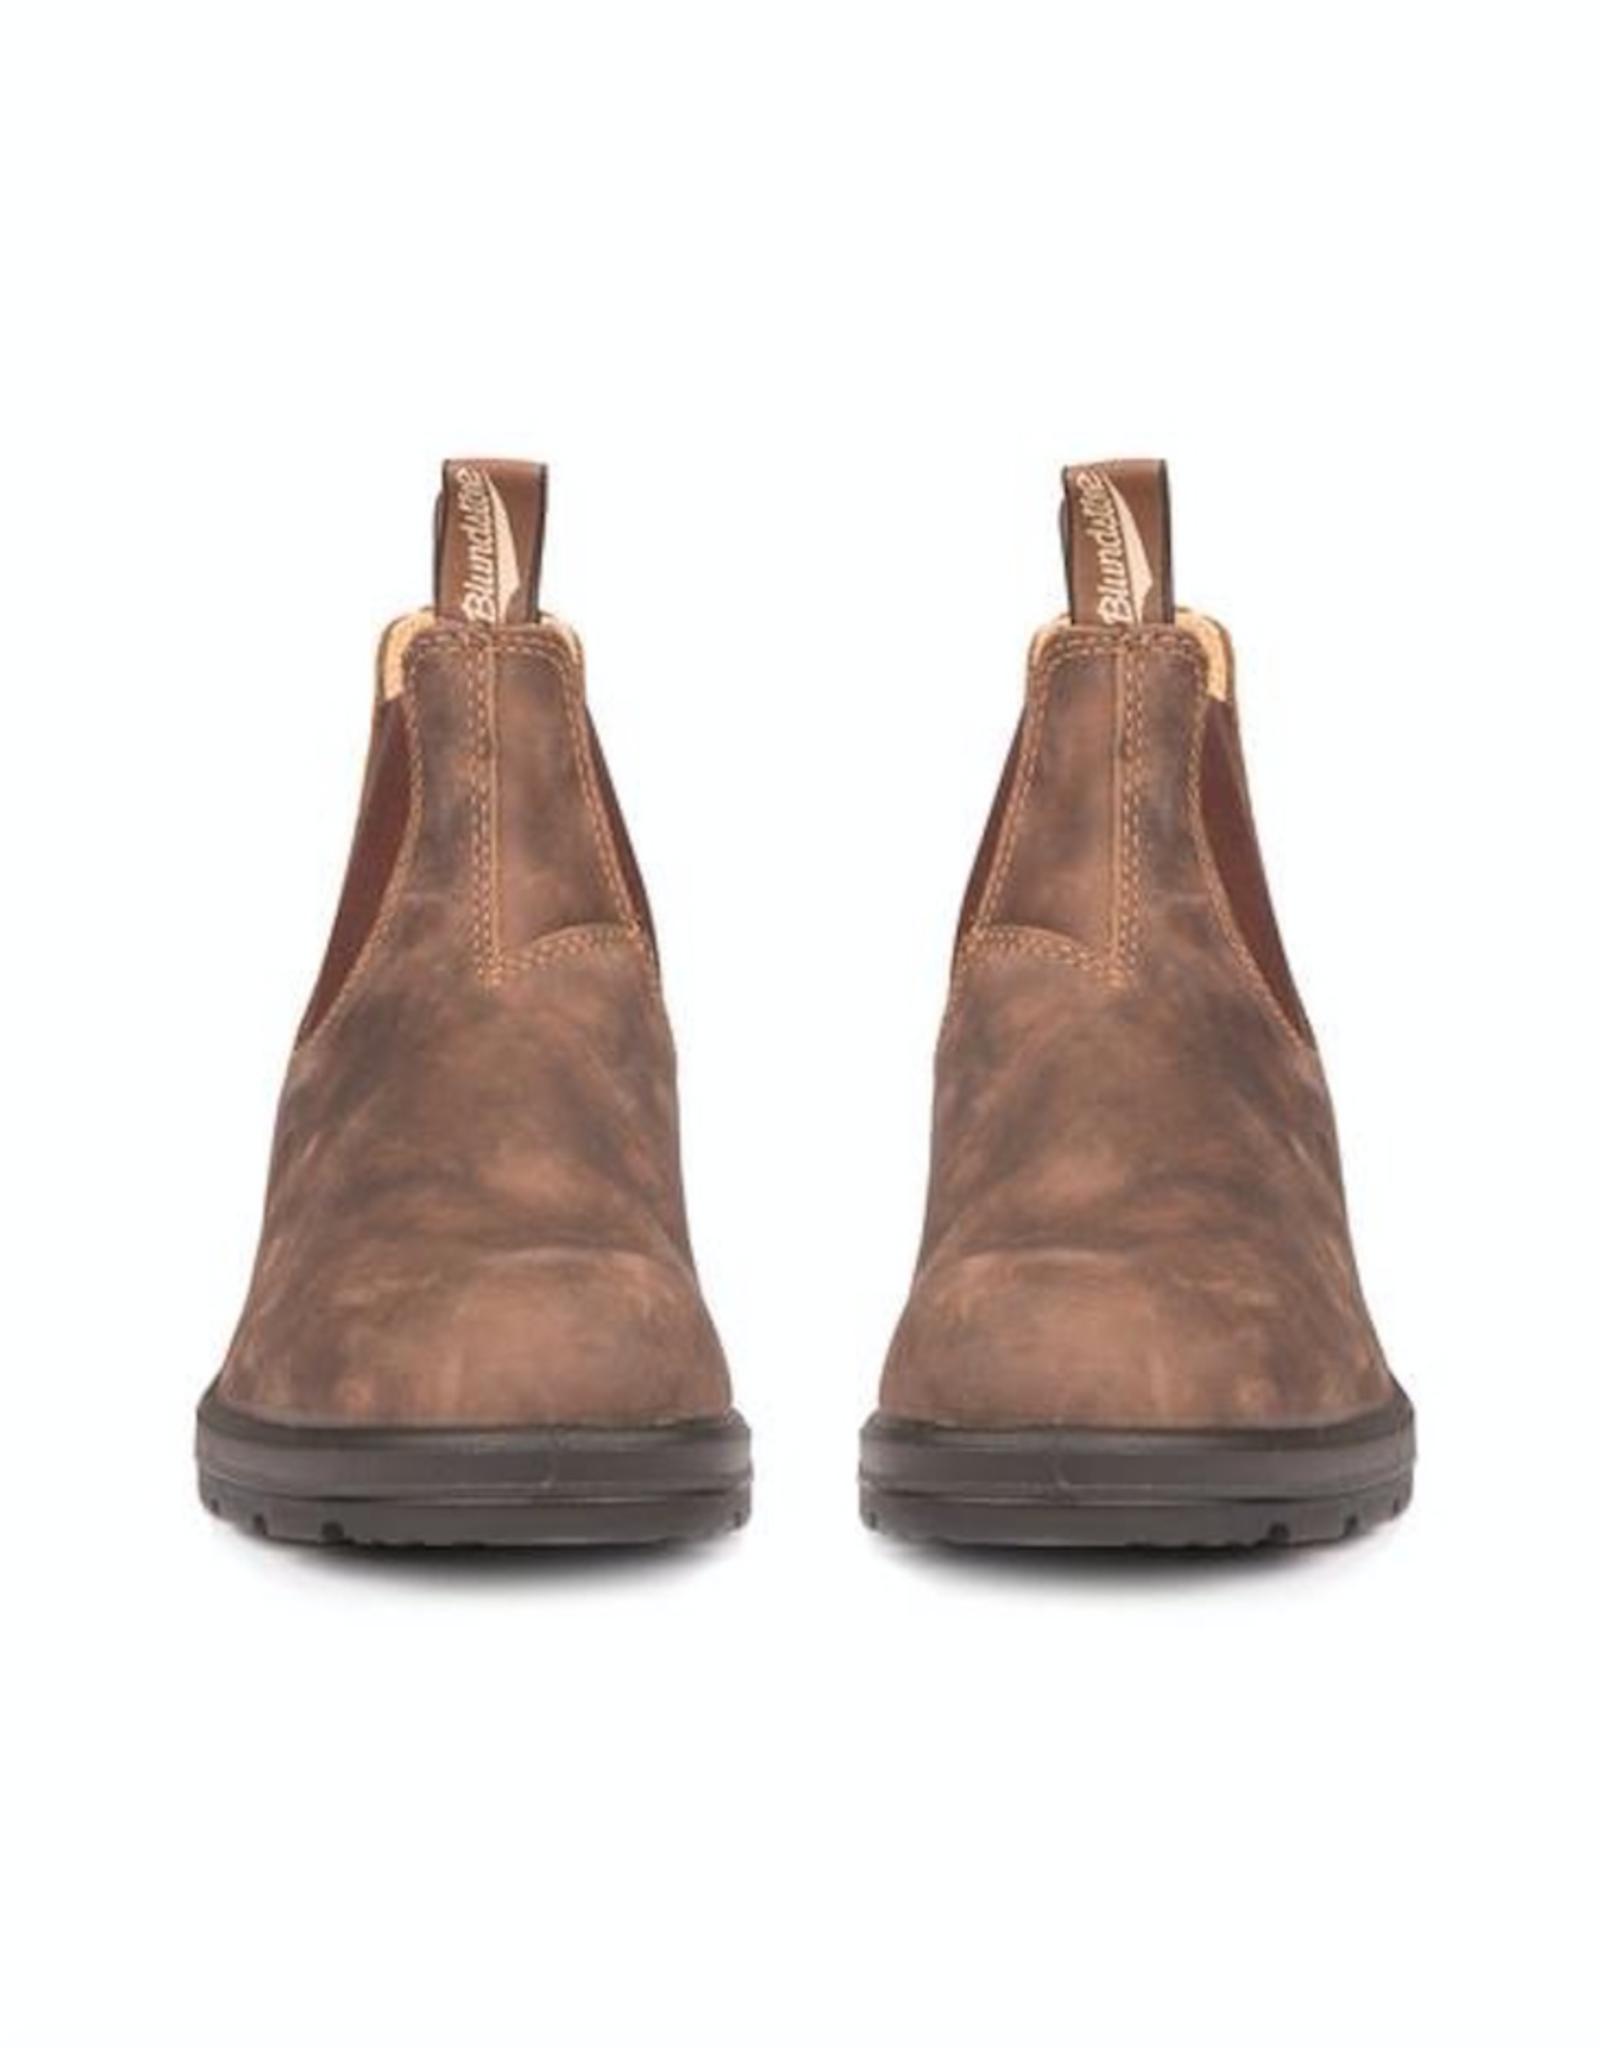 Blundstone 585 Rustic Brown Classic Boot